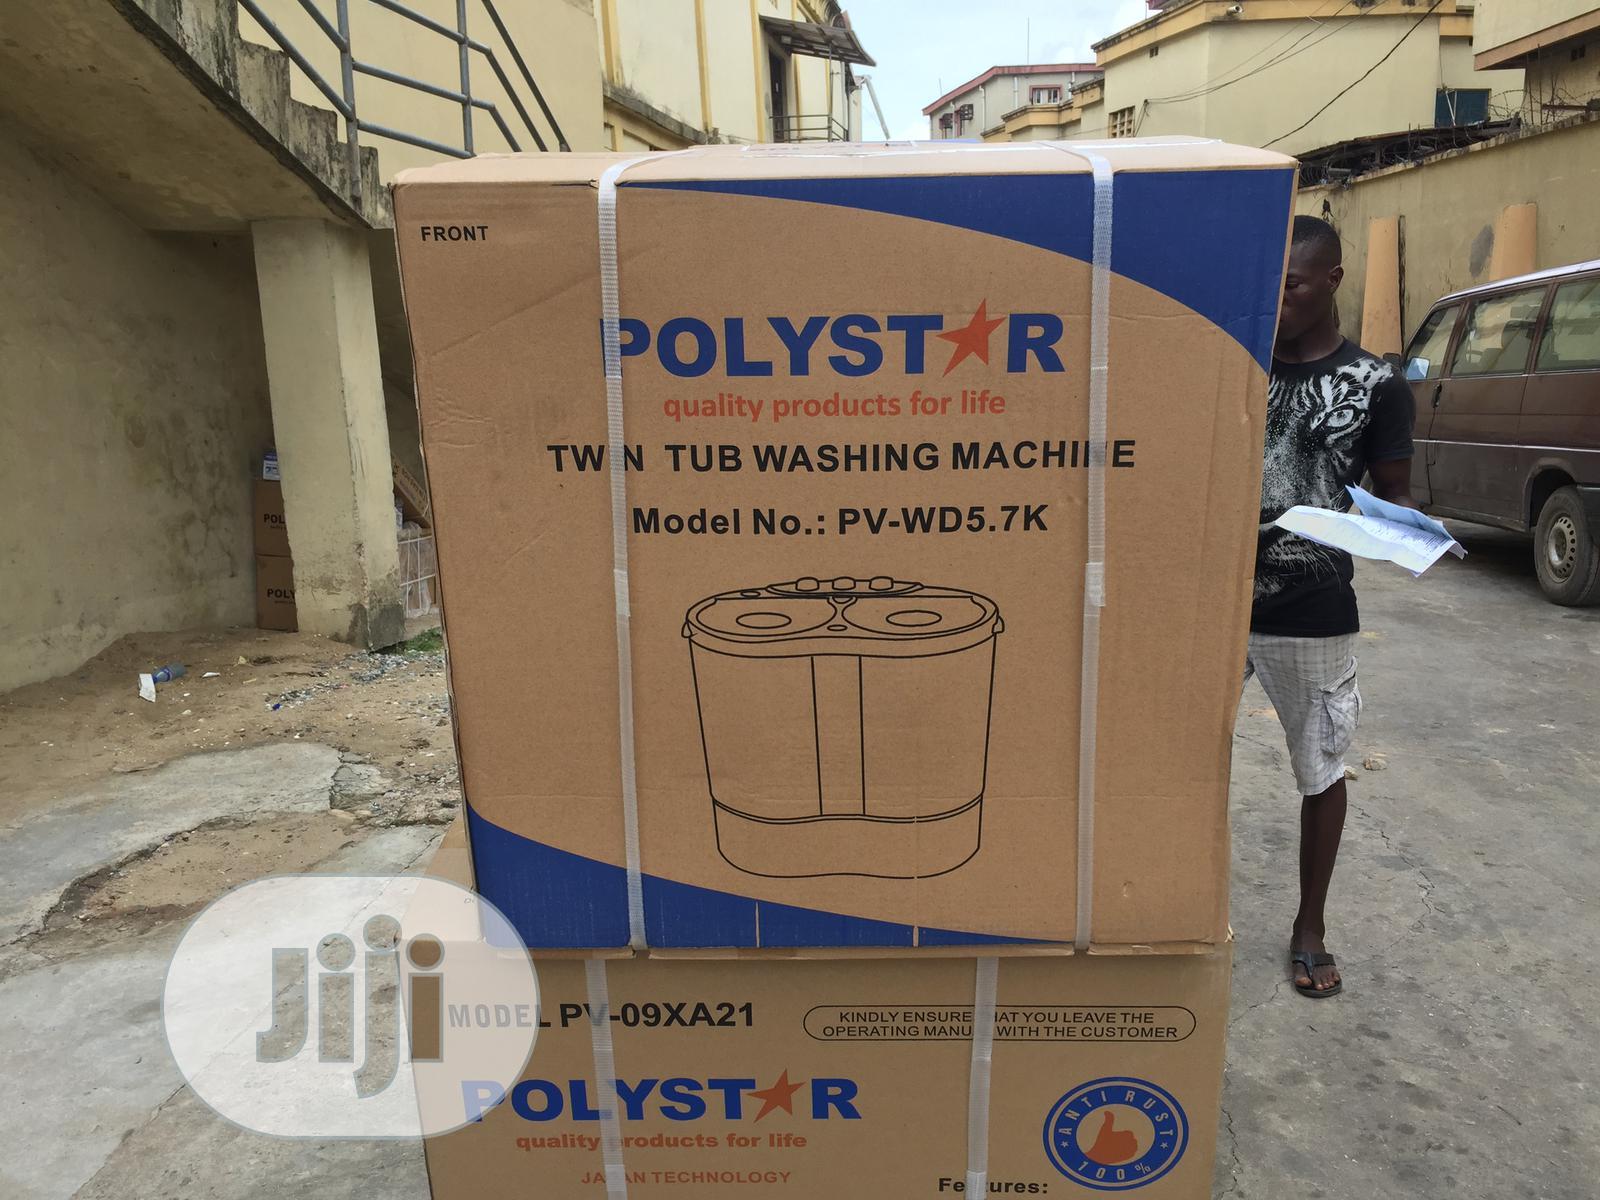 Polystar 5. 7kg Washing Machine | Home Appliances for sale in Amuwo-Odofin, Lagos State, Nigeria